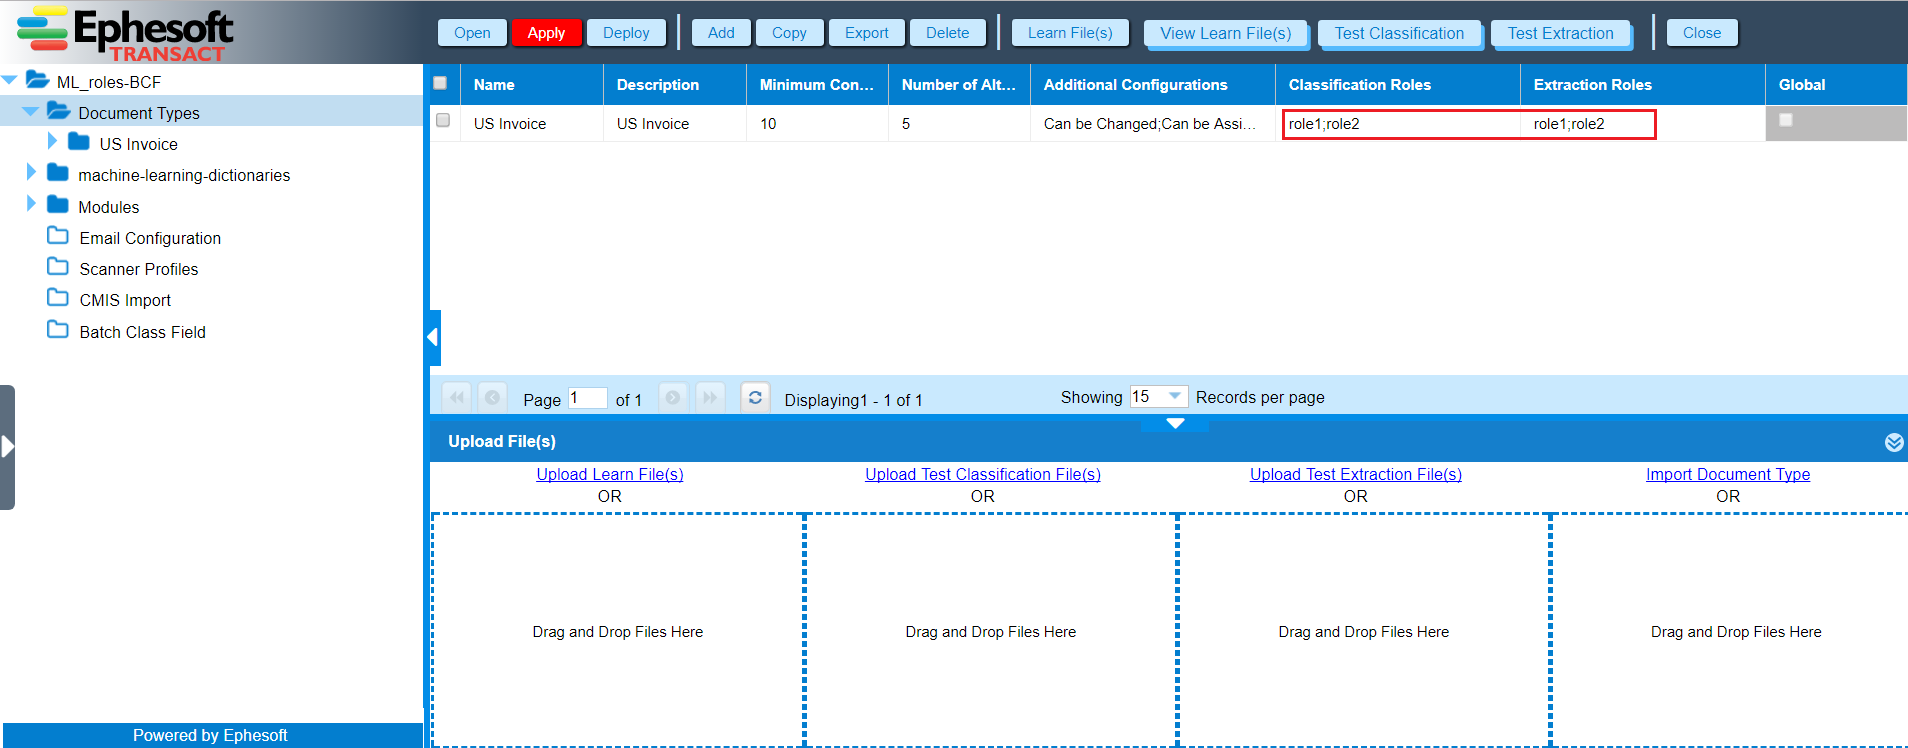 C:\Users\Ephesoft\AppData\Local\Microsoft\Windows\INetCache\Content.Word\2.png